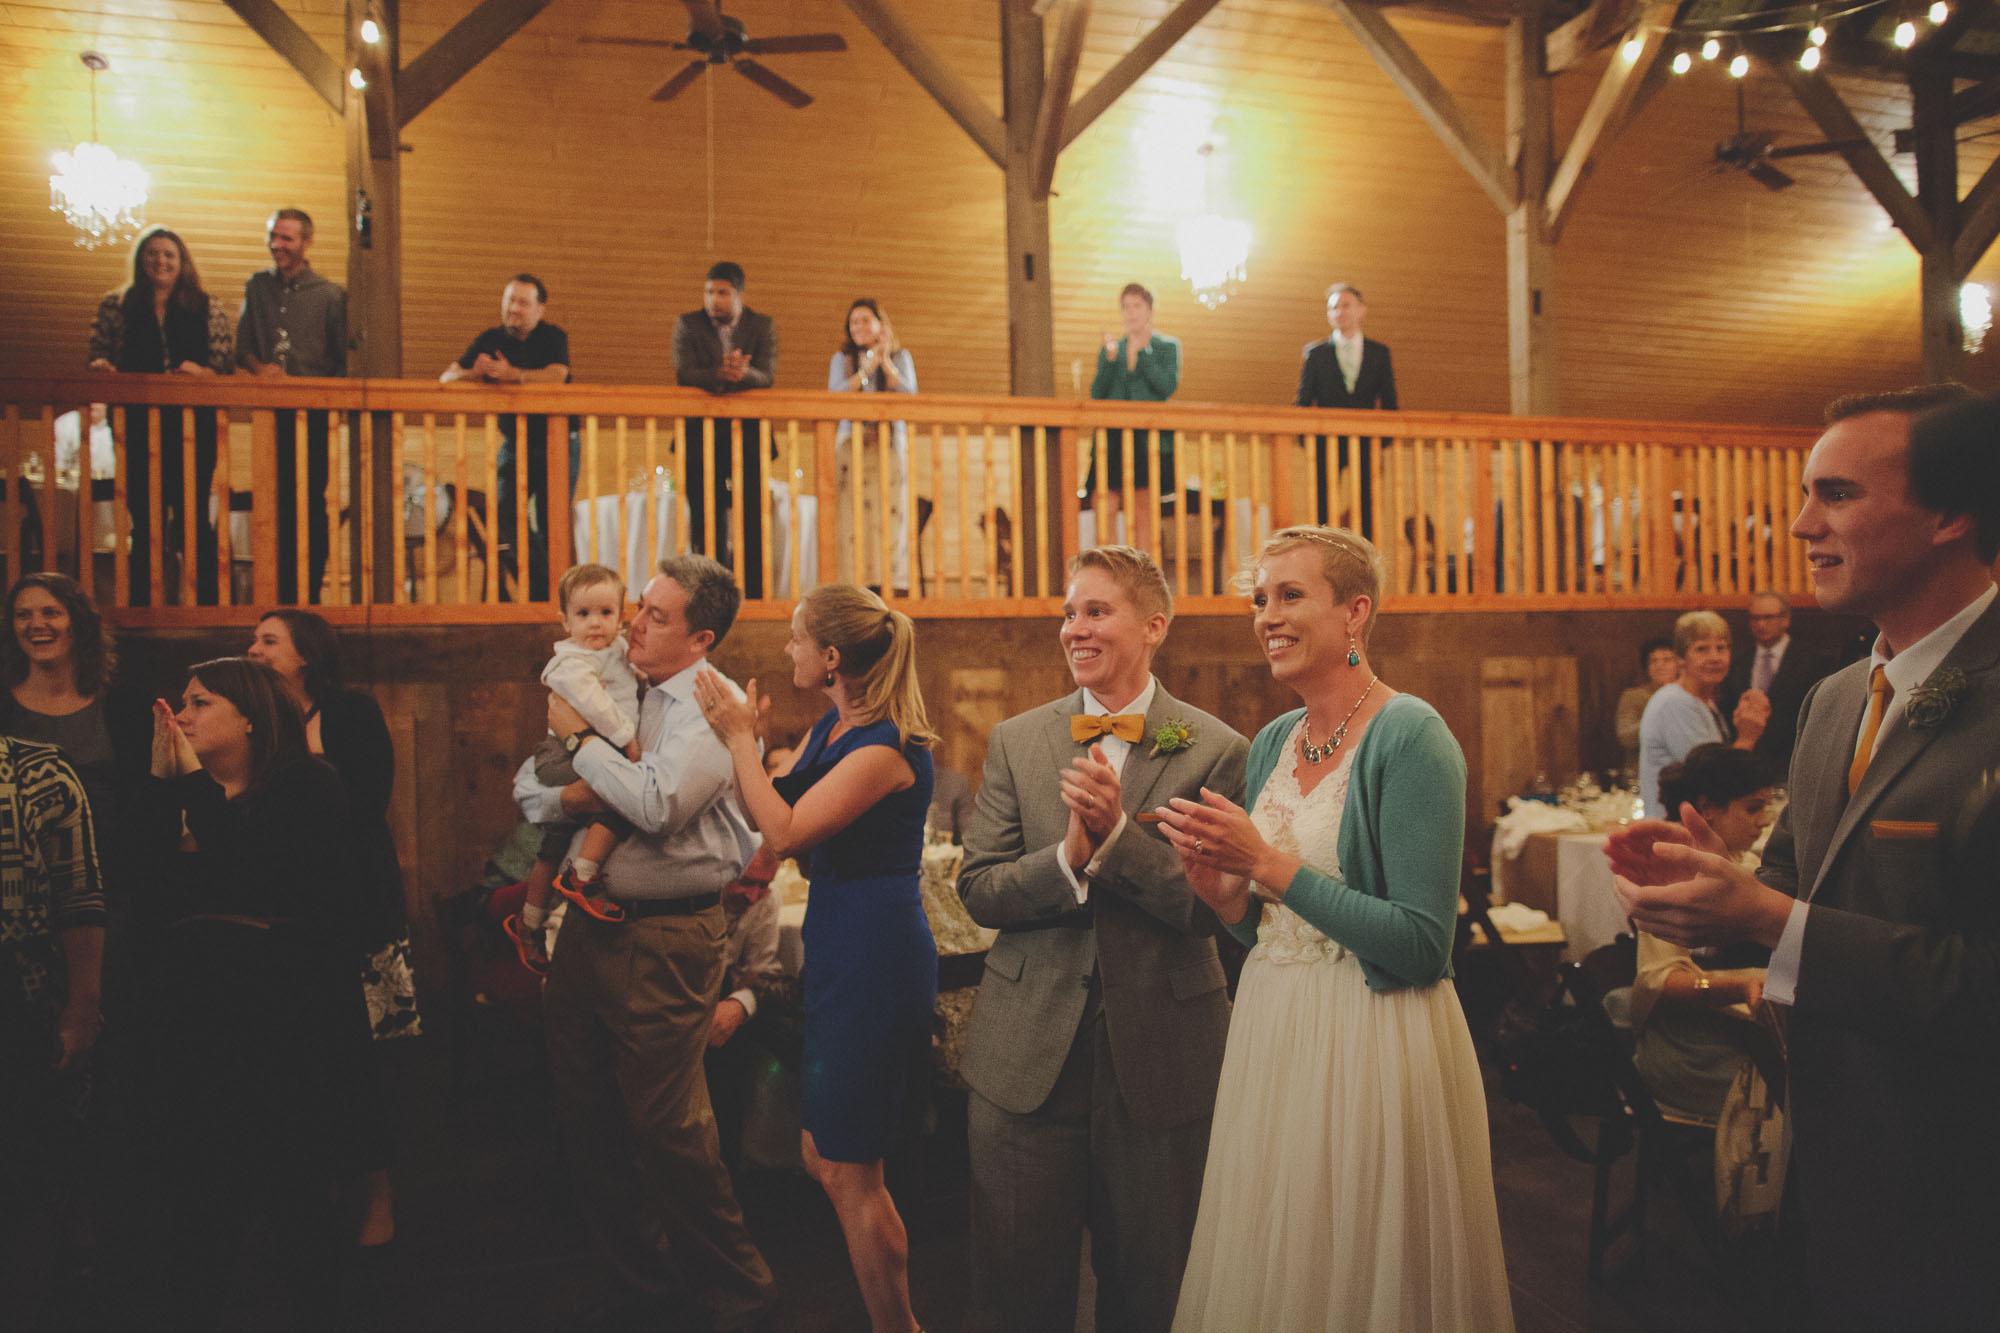 Gretchen_Gause_Petaluma_Olympias_Valley_Wedding_Photo-253.jpg